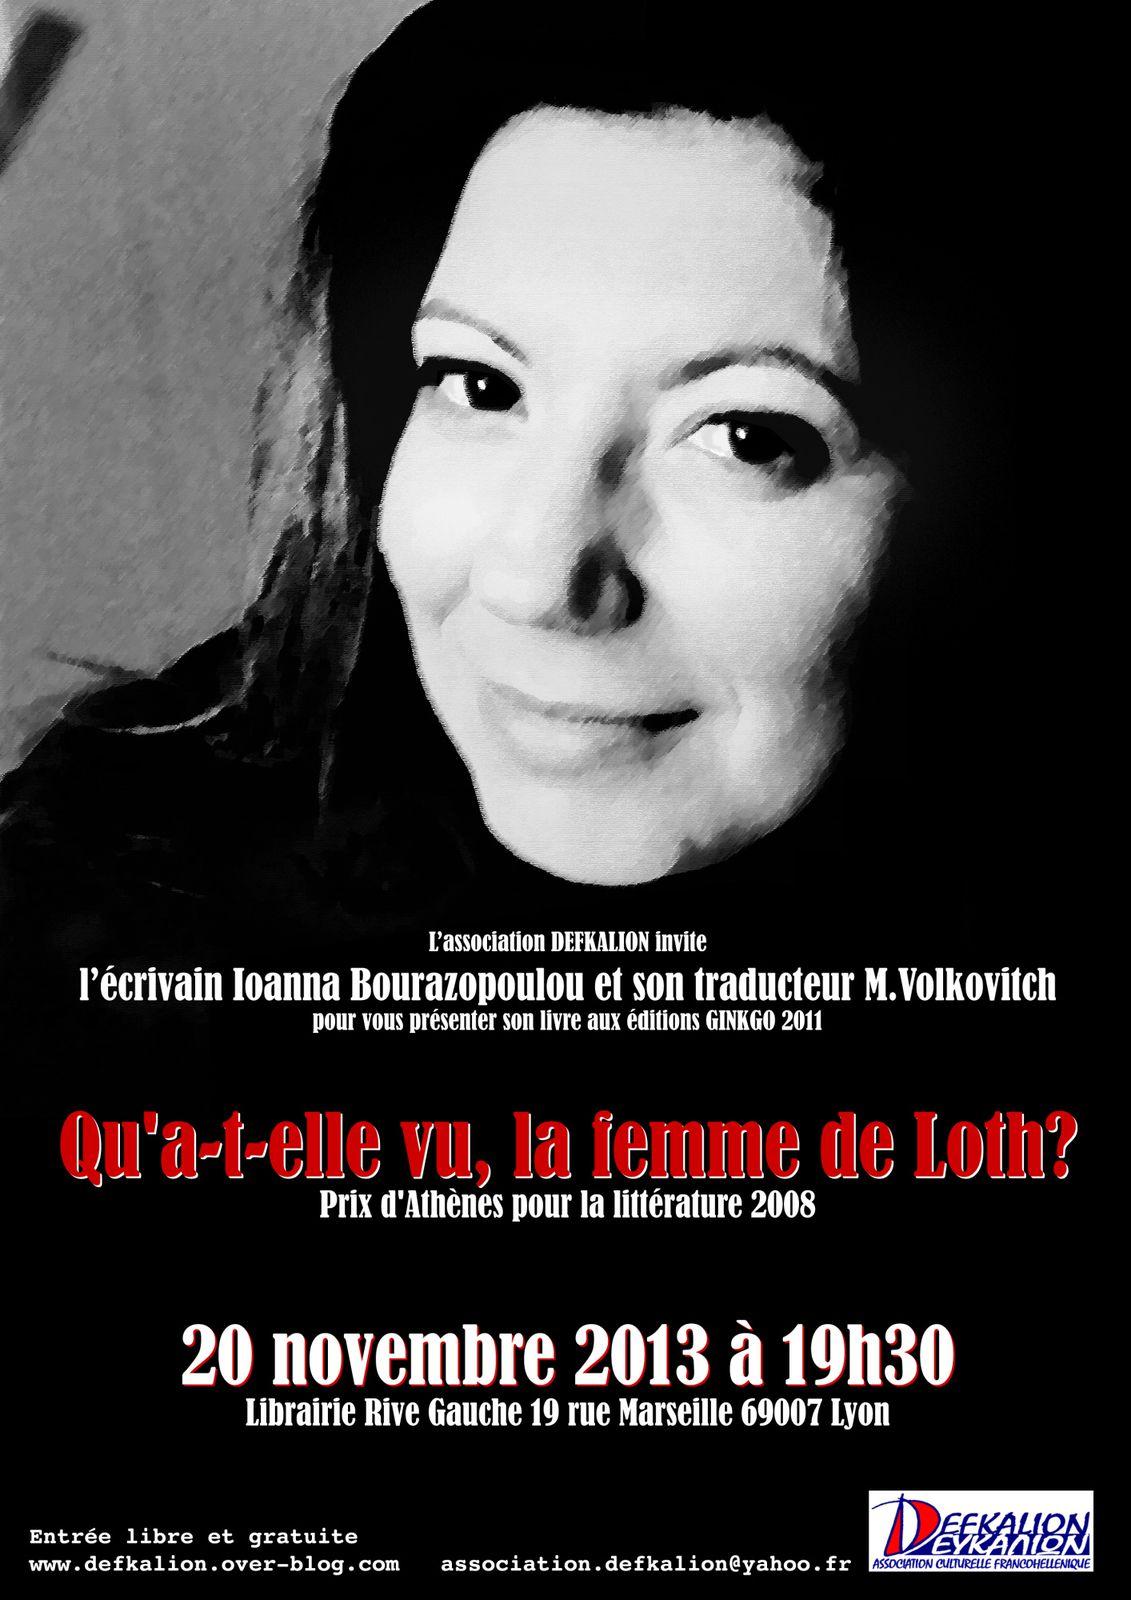 Ioànna Bourazopoùlou - 20 novembre à 19h30